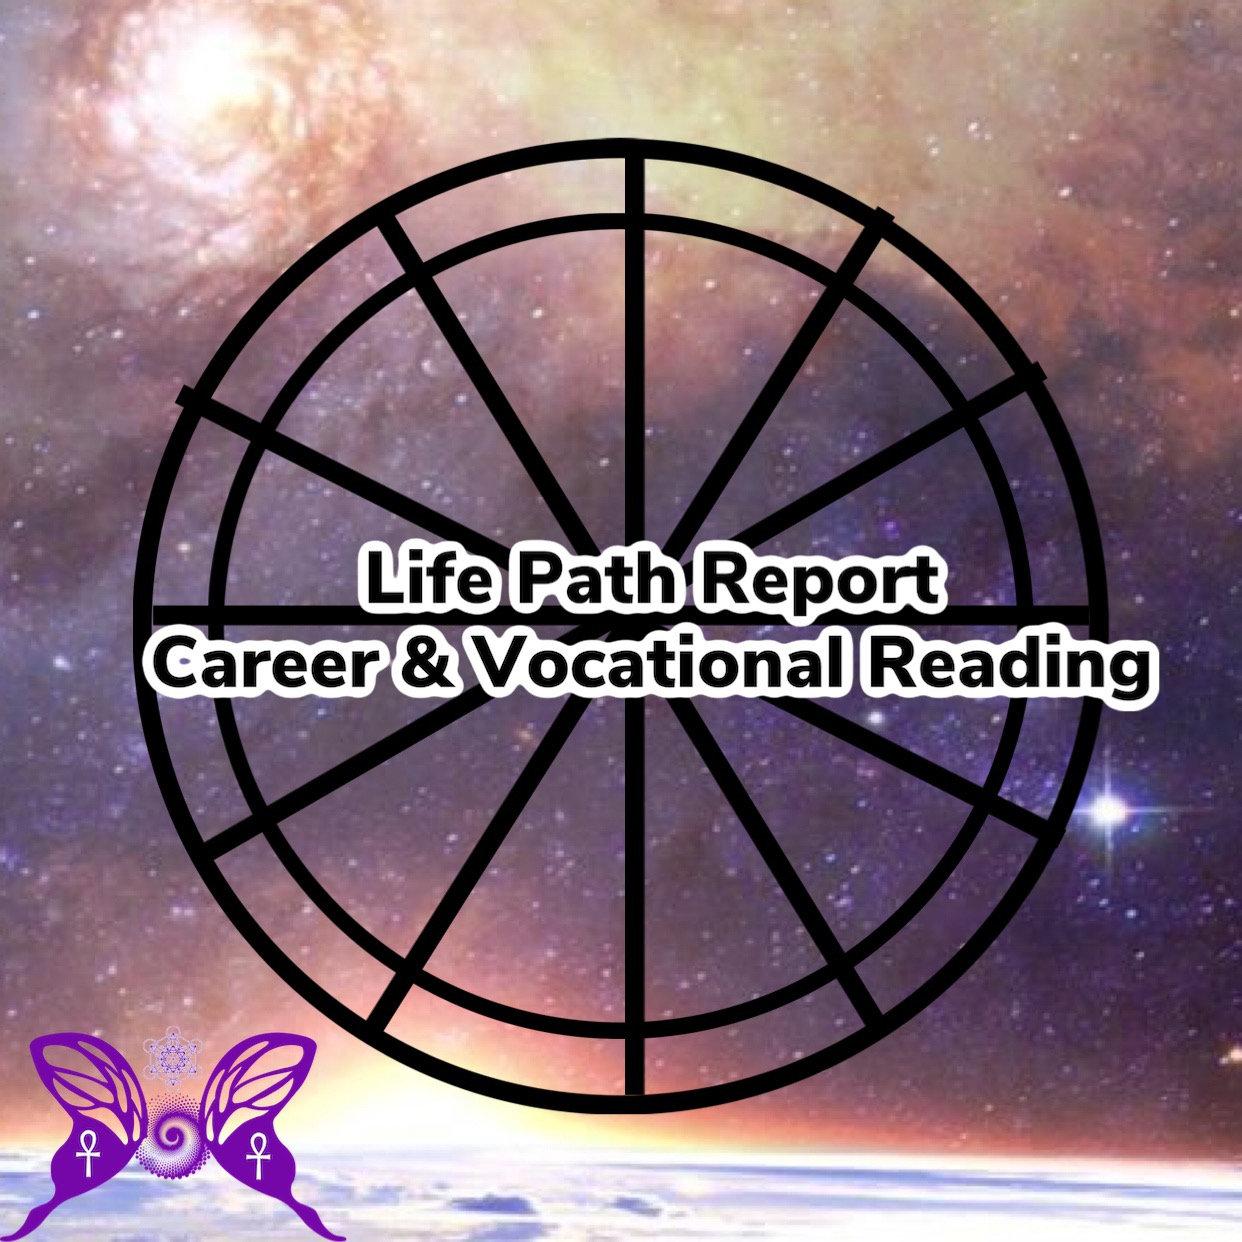 Life Path Report